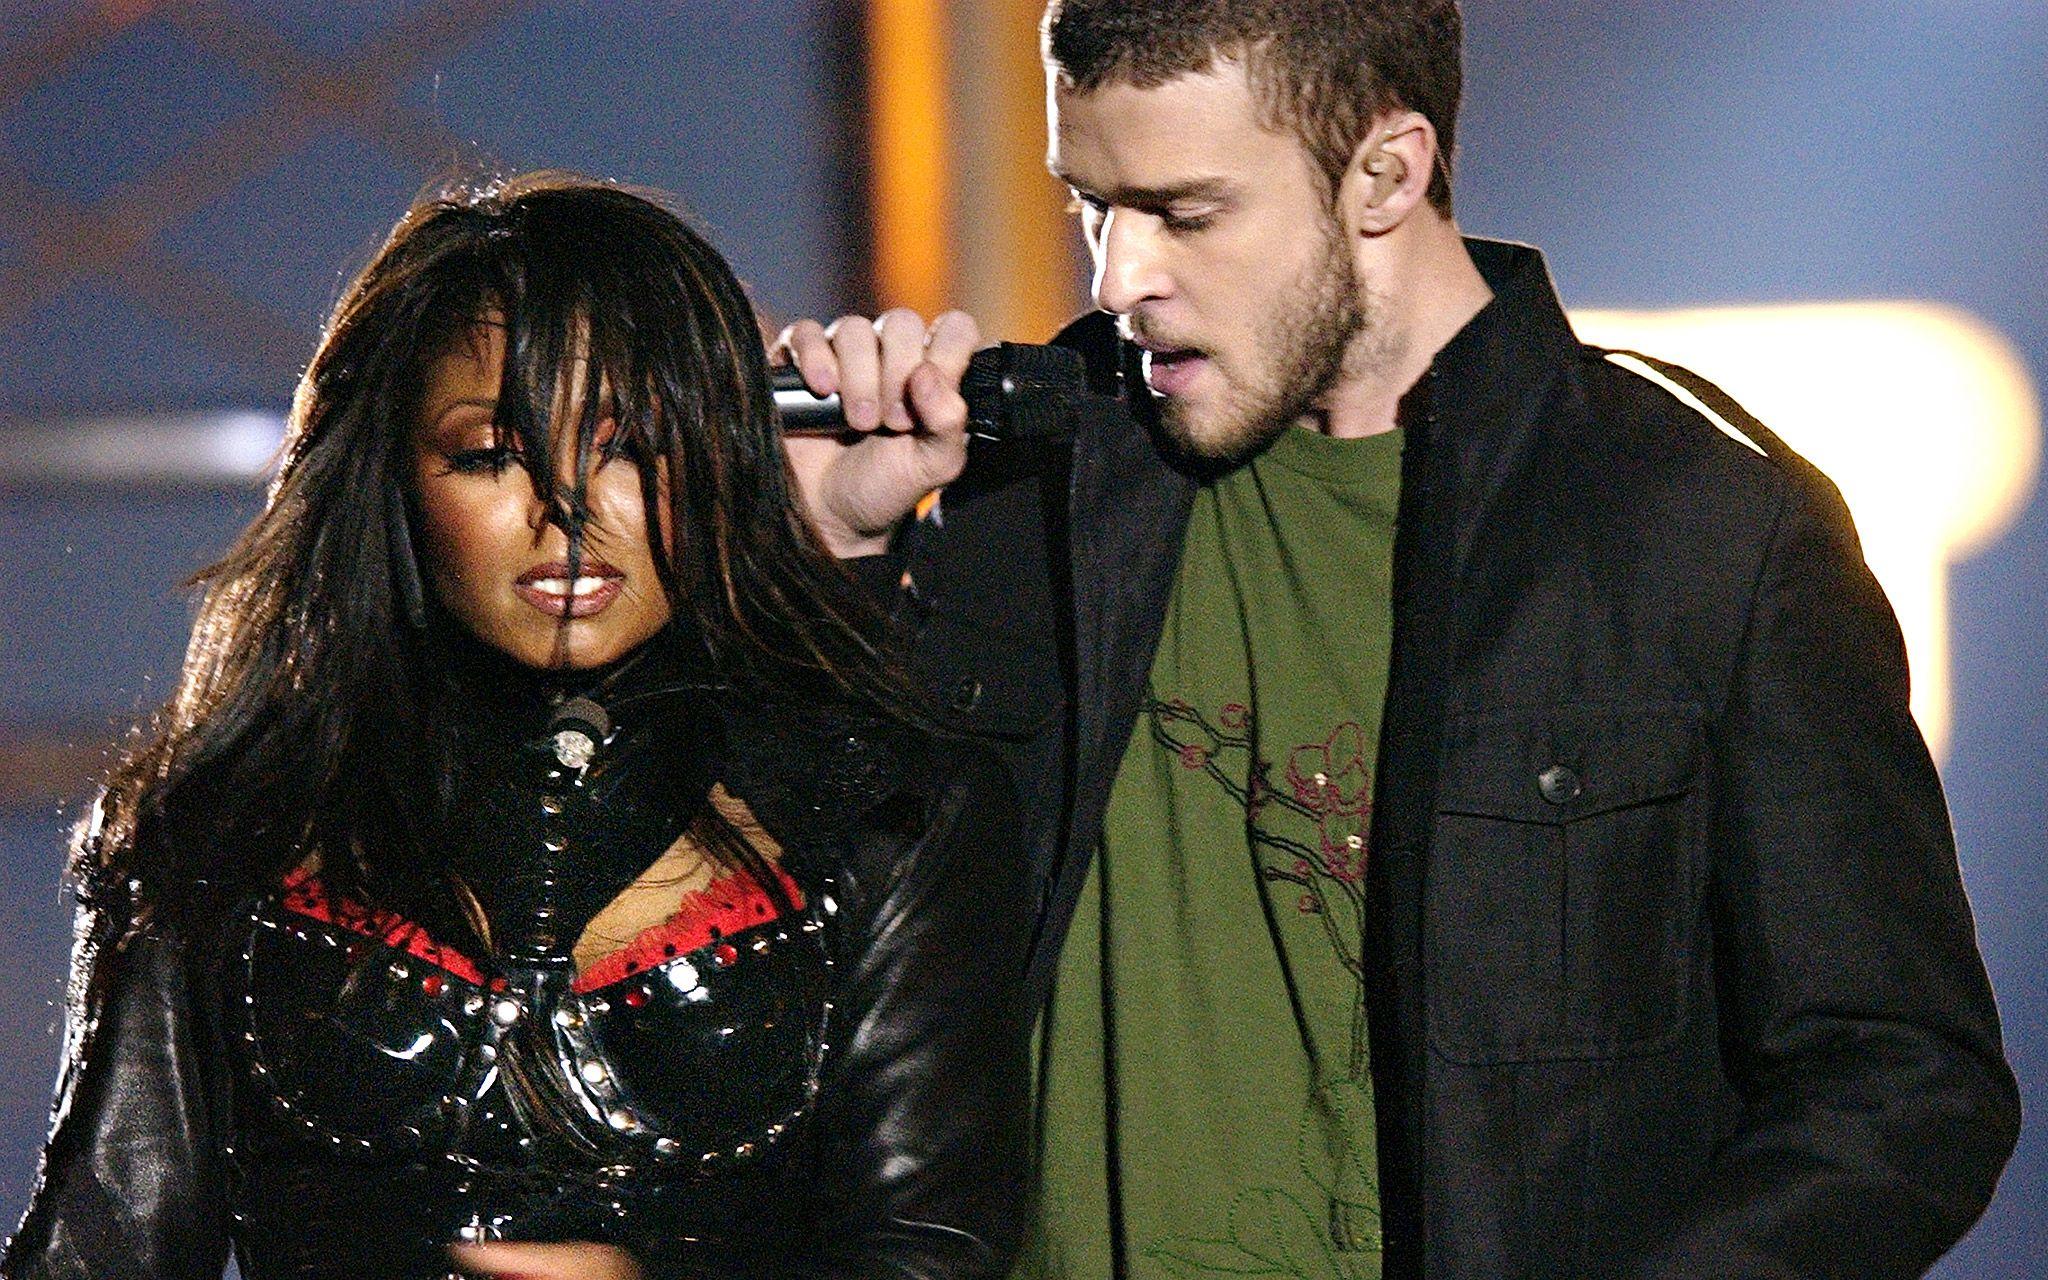 Janet Jackson y Justin Timberlake minutos antes del Nipplegate